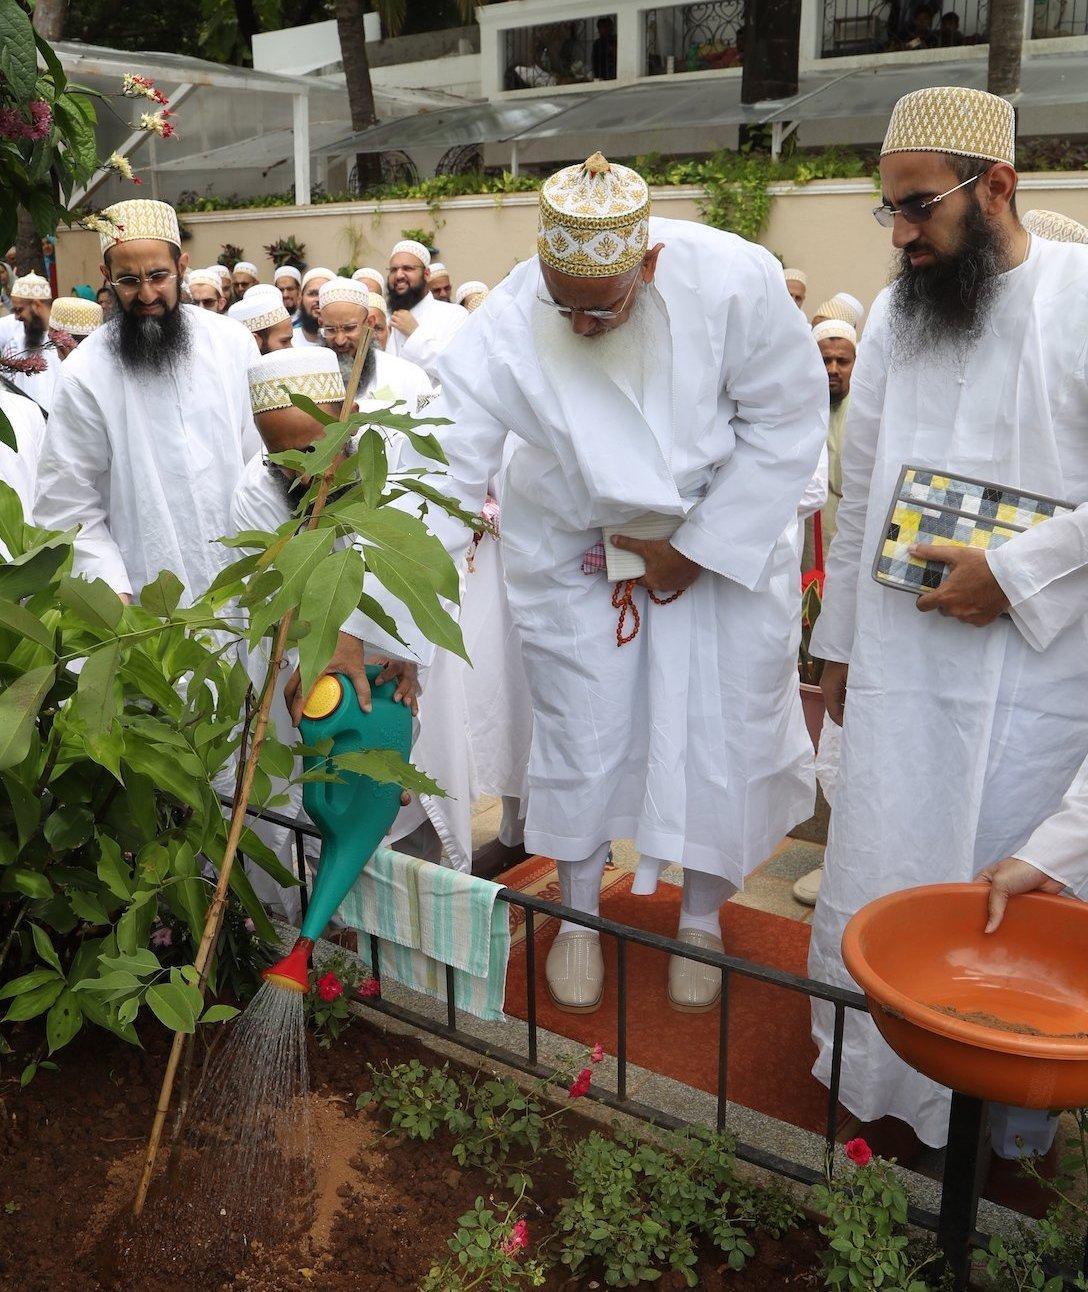 Syedna Mufaddal Saifuddin planting and watering a tree sapling, Environment